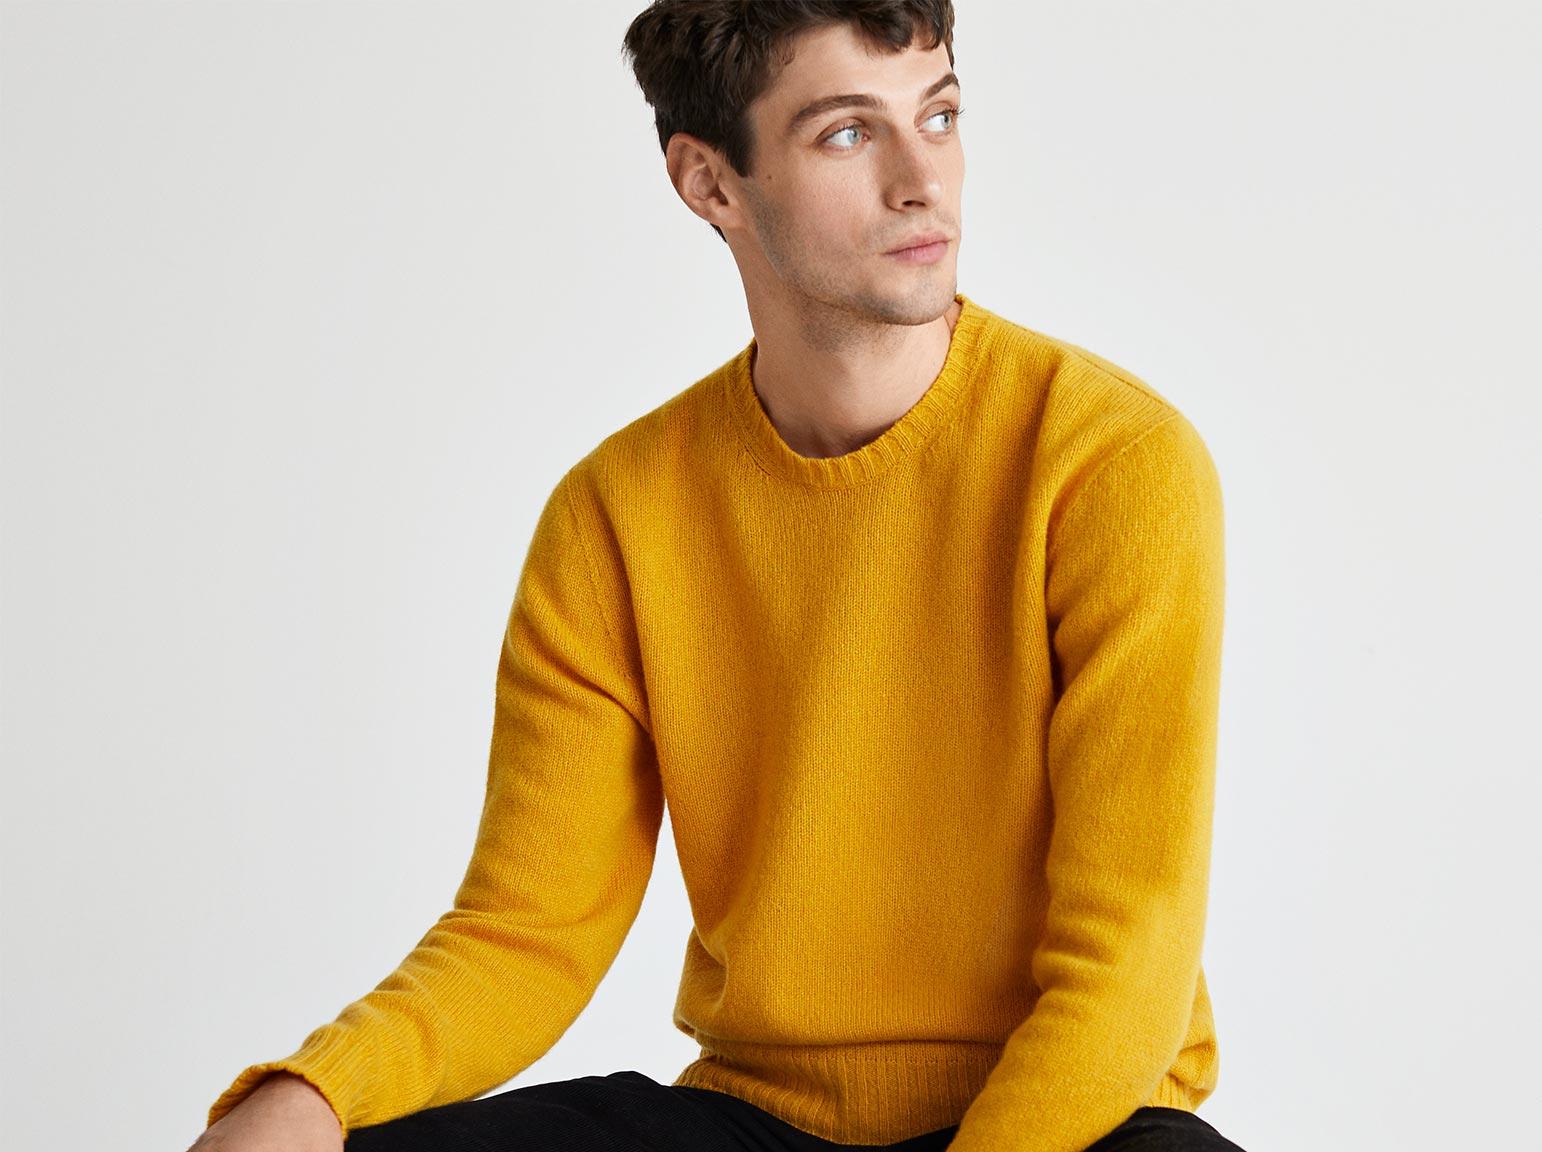 Man wearing yellow cashmere jumper